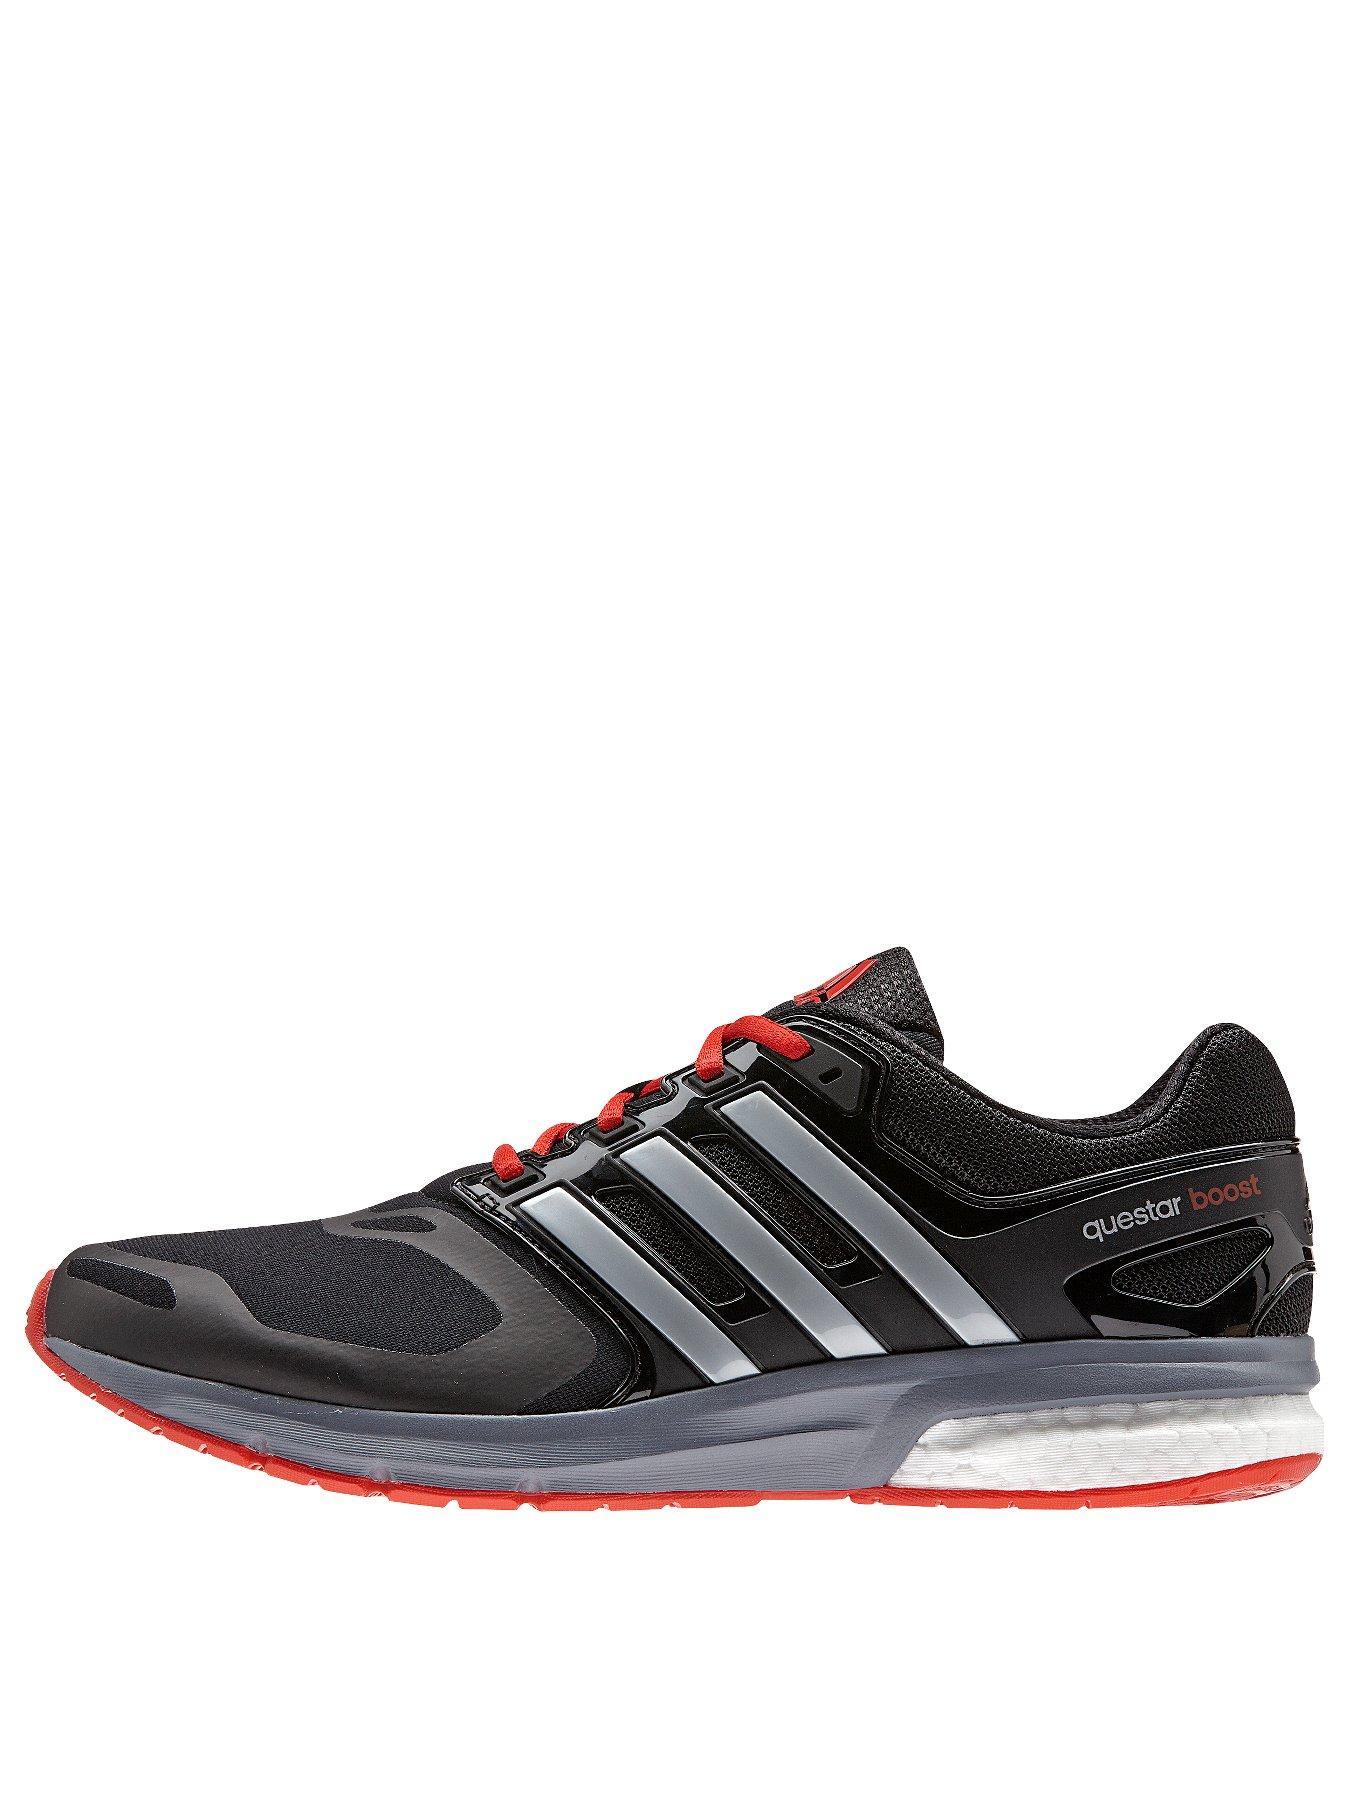 Adidas Questar Boost TF Trainers